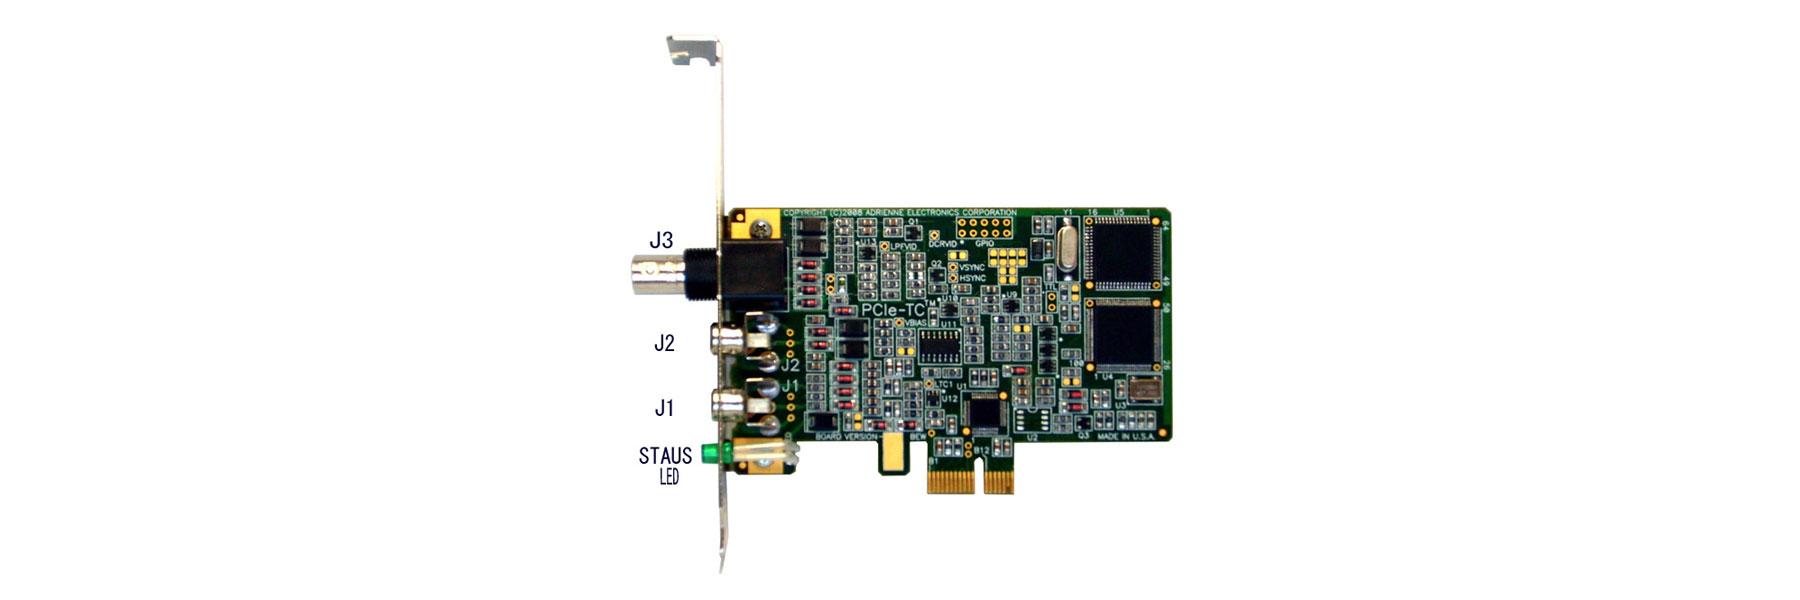 PCIe_640